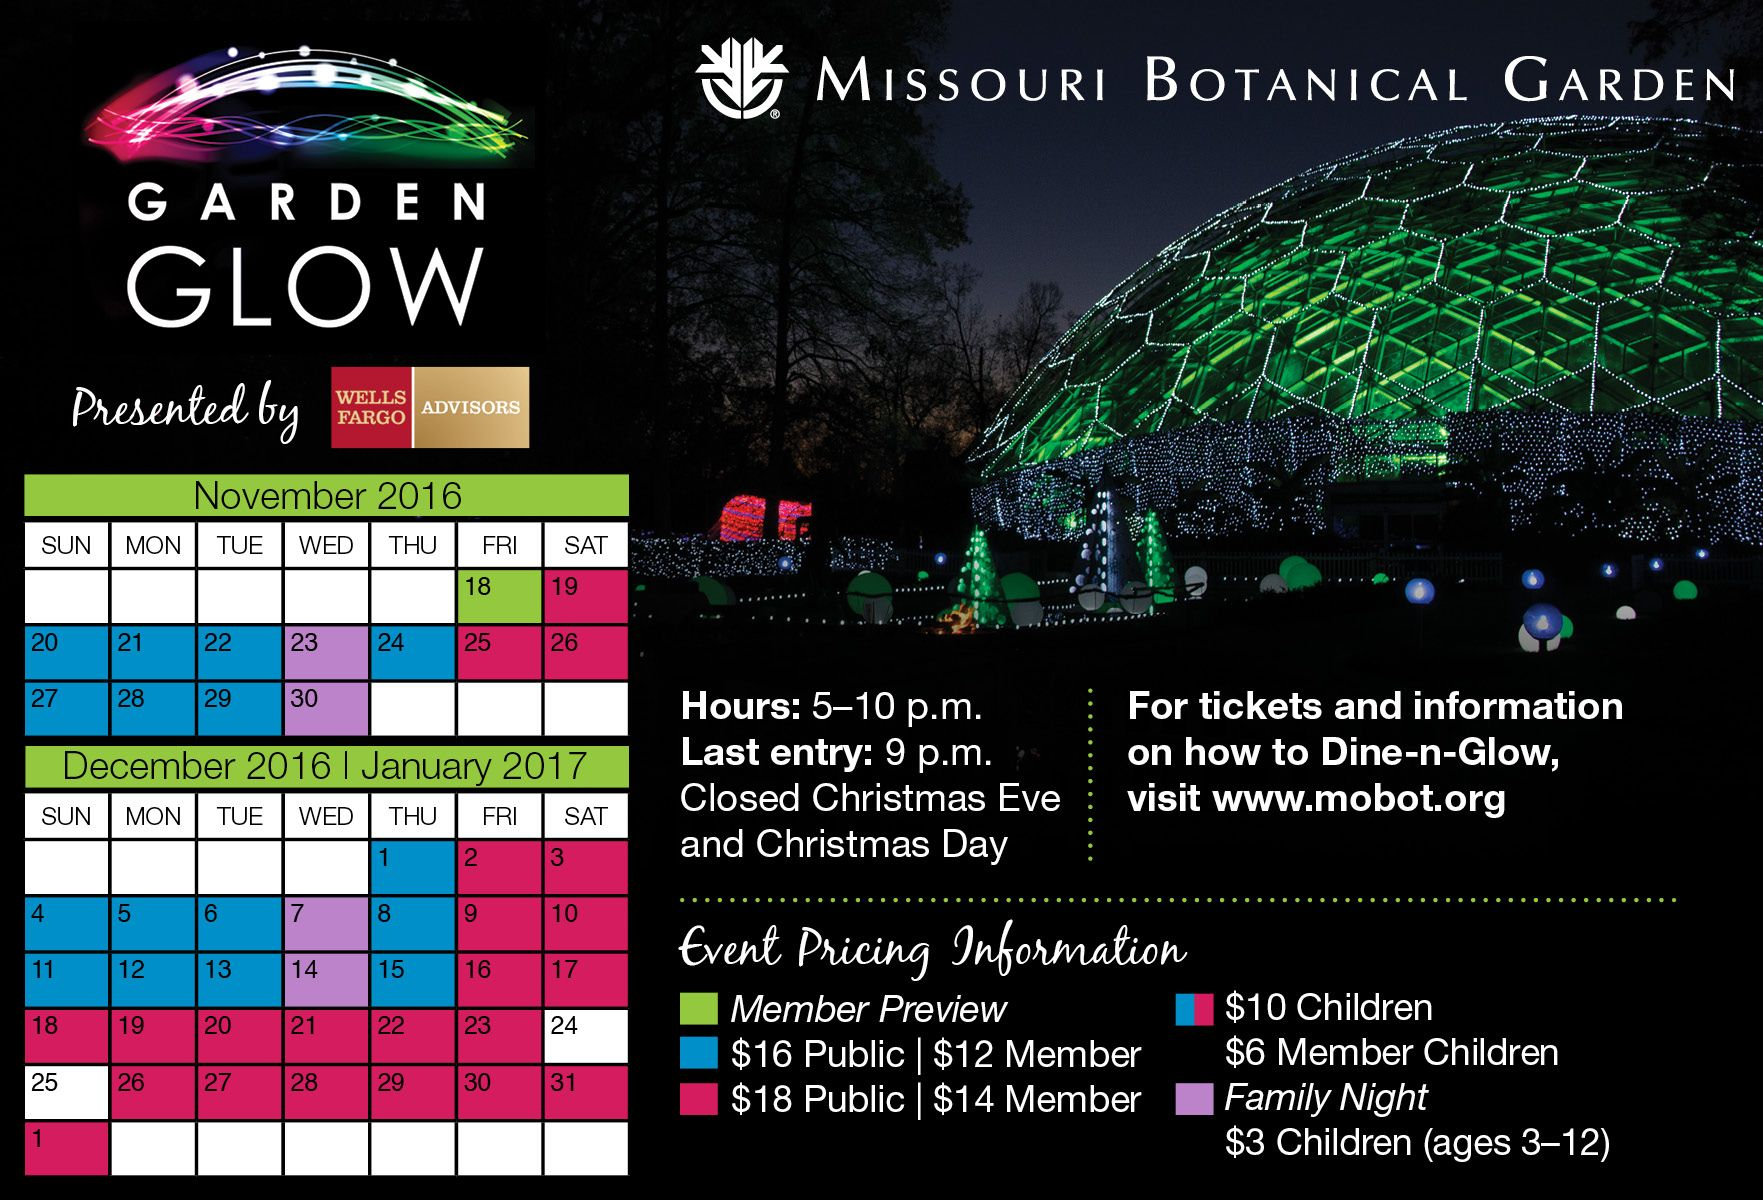 Garden Glow (With images) Missouri botanical garden, Glow